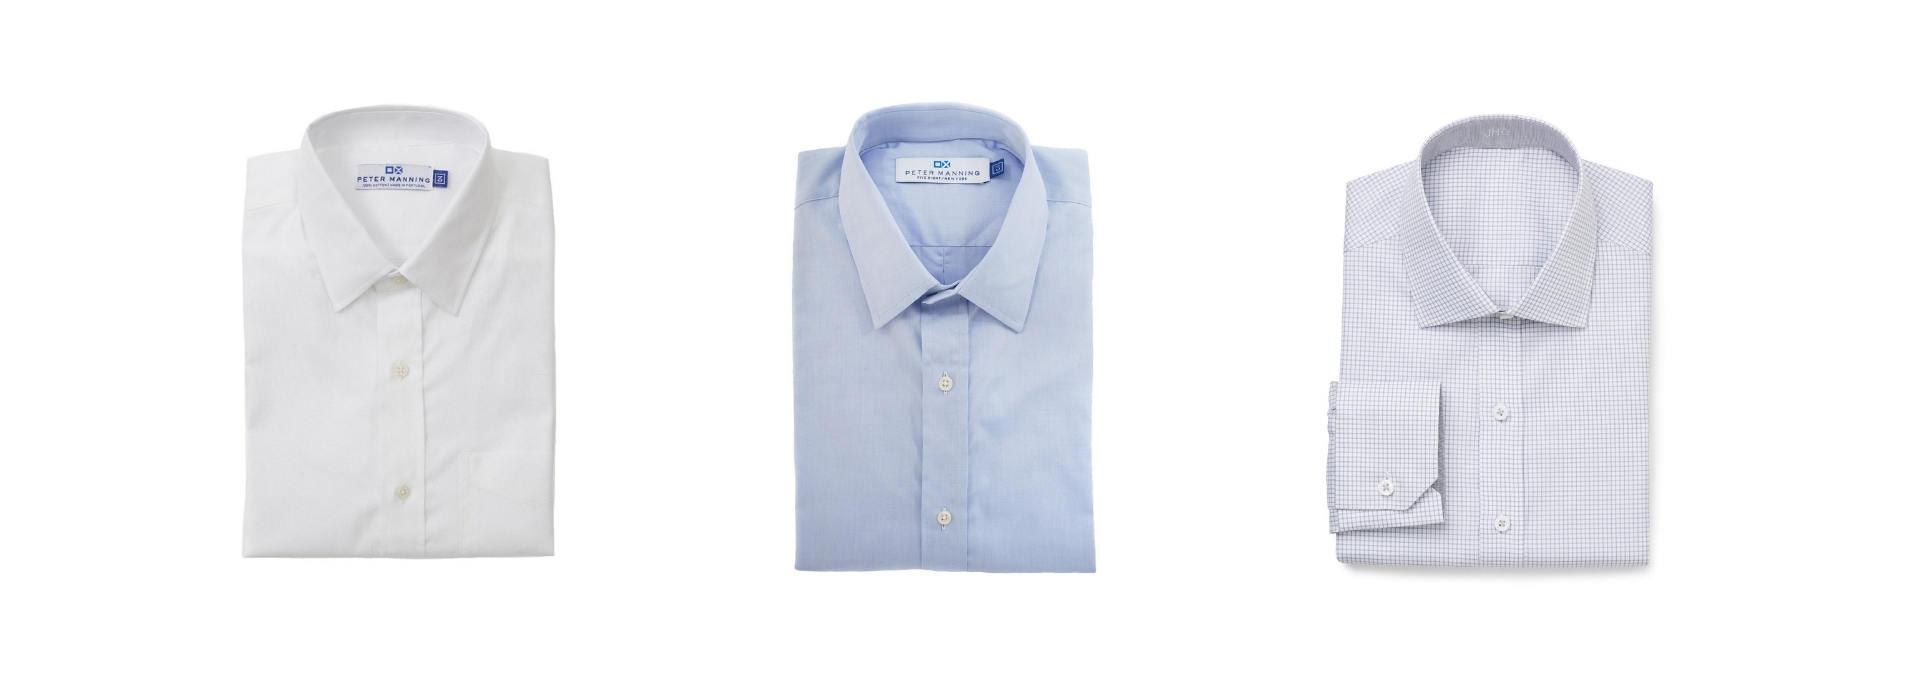 Minimal dress shirt collection